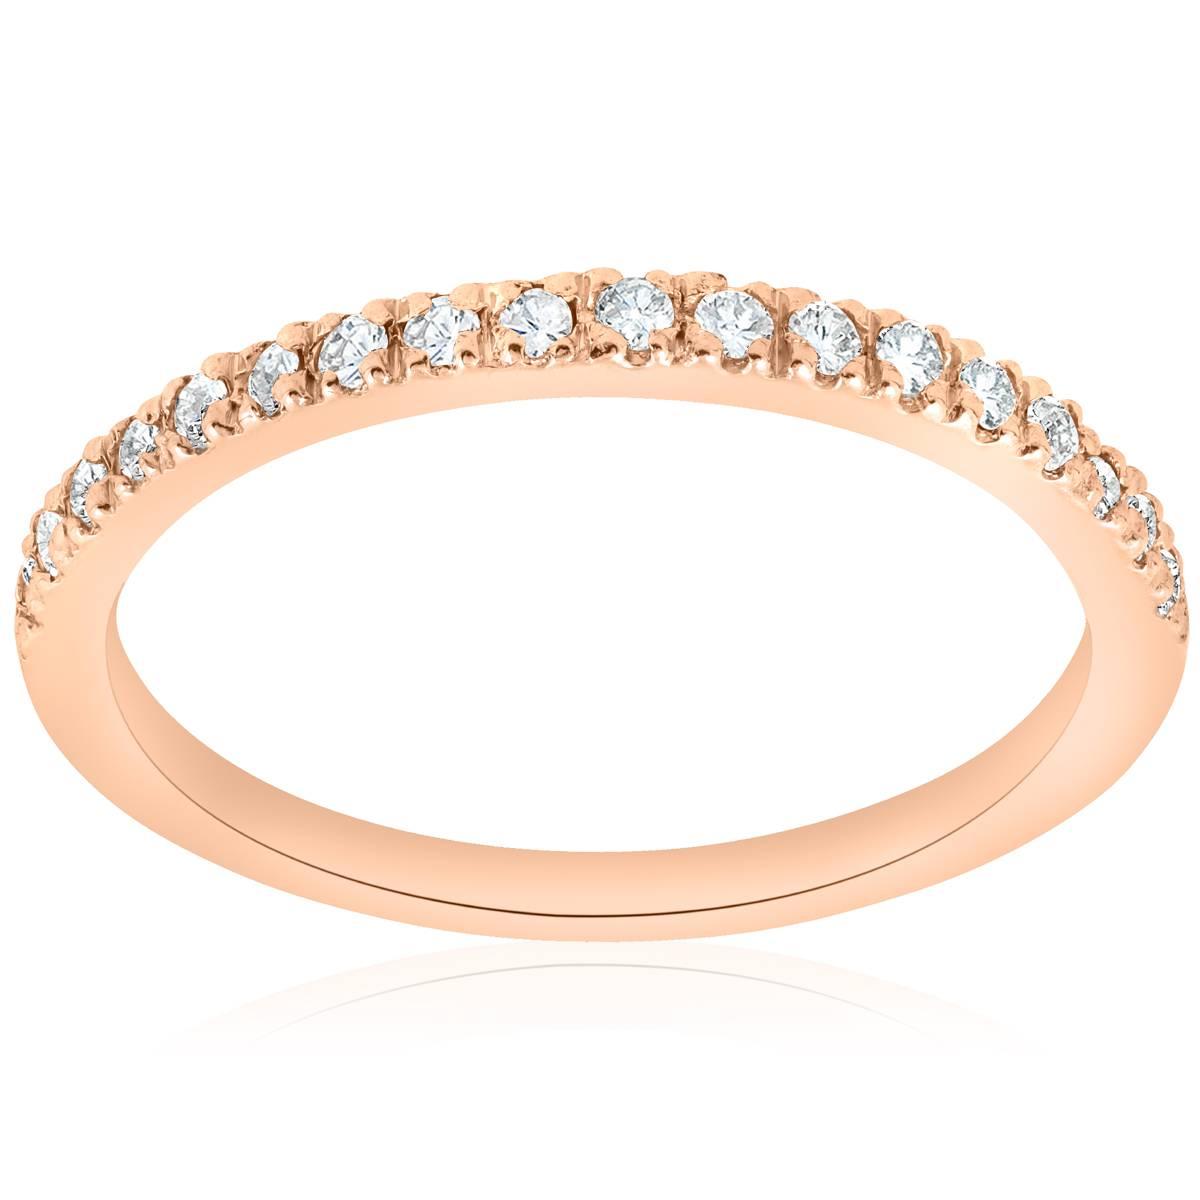 1/4ct Diamond Ring 14K Rose Gold Womens Diamond Wedding